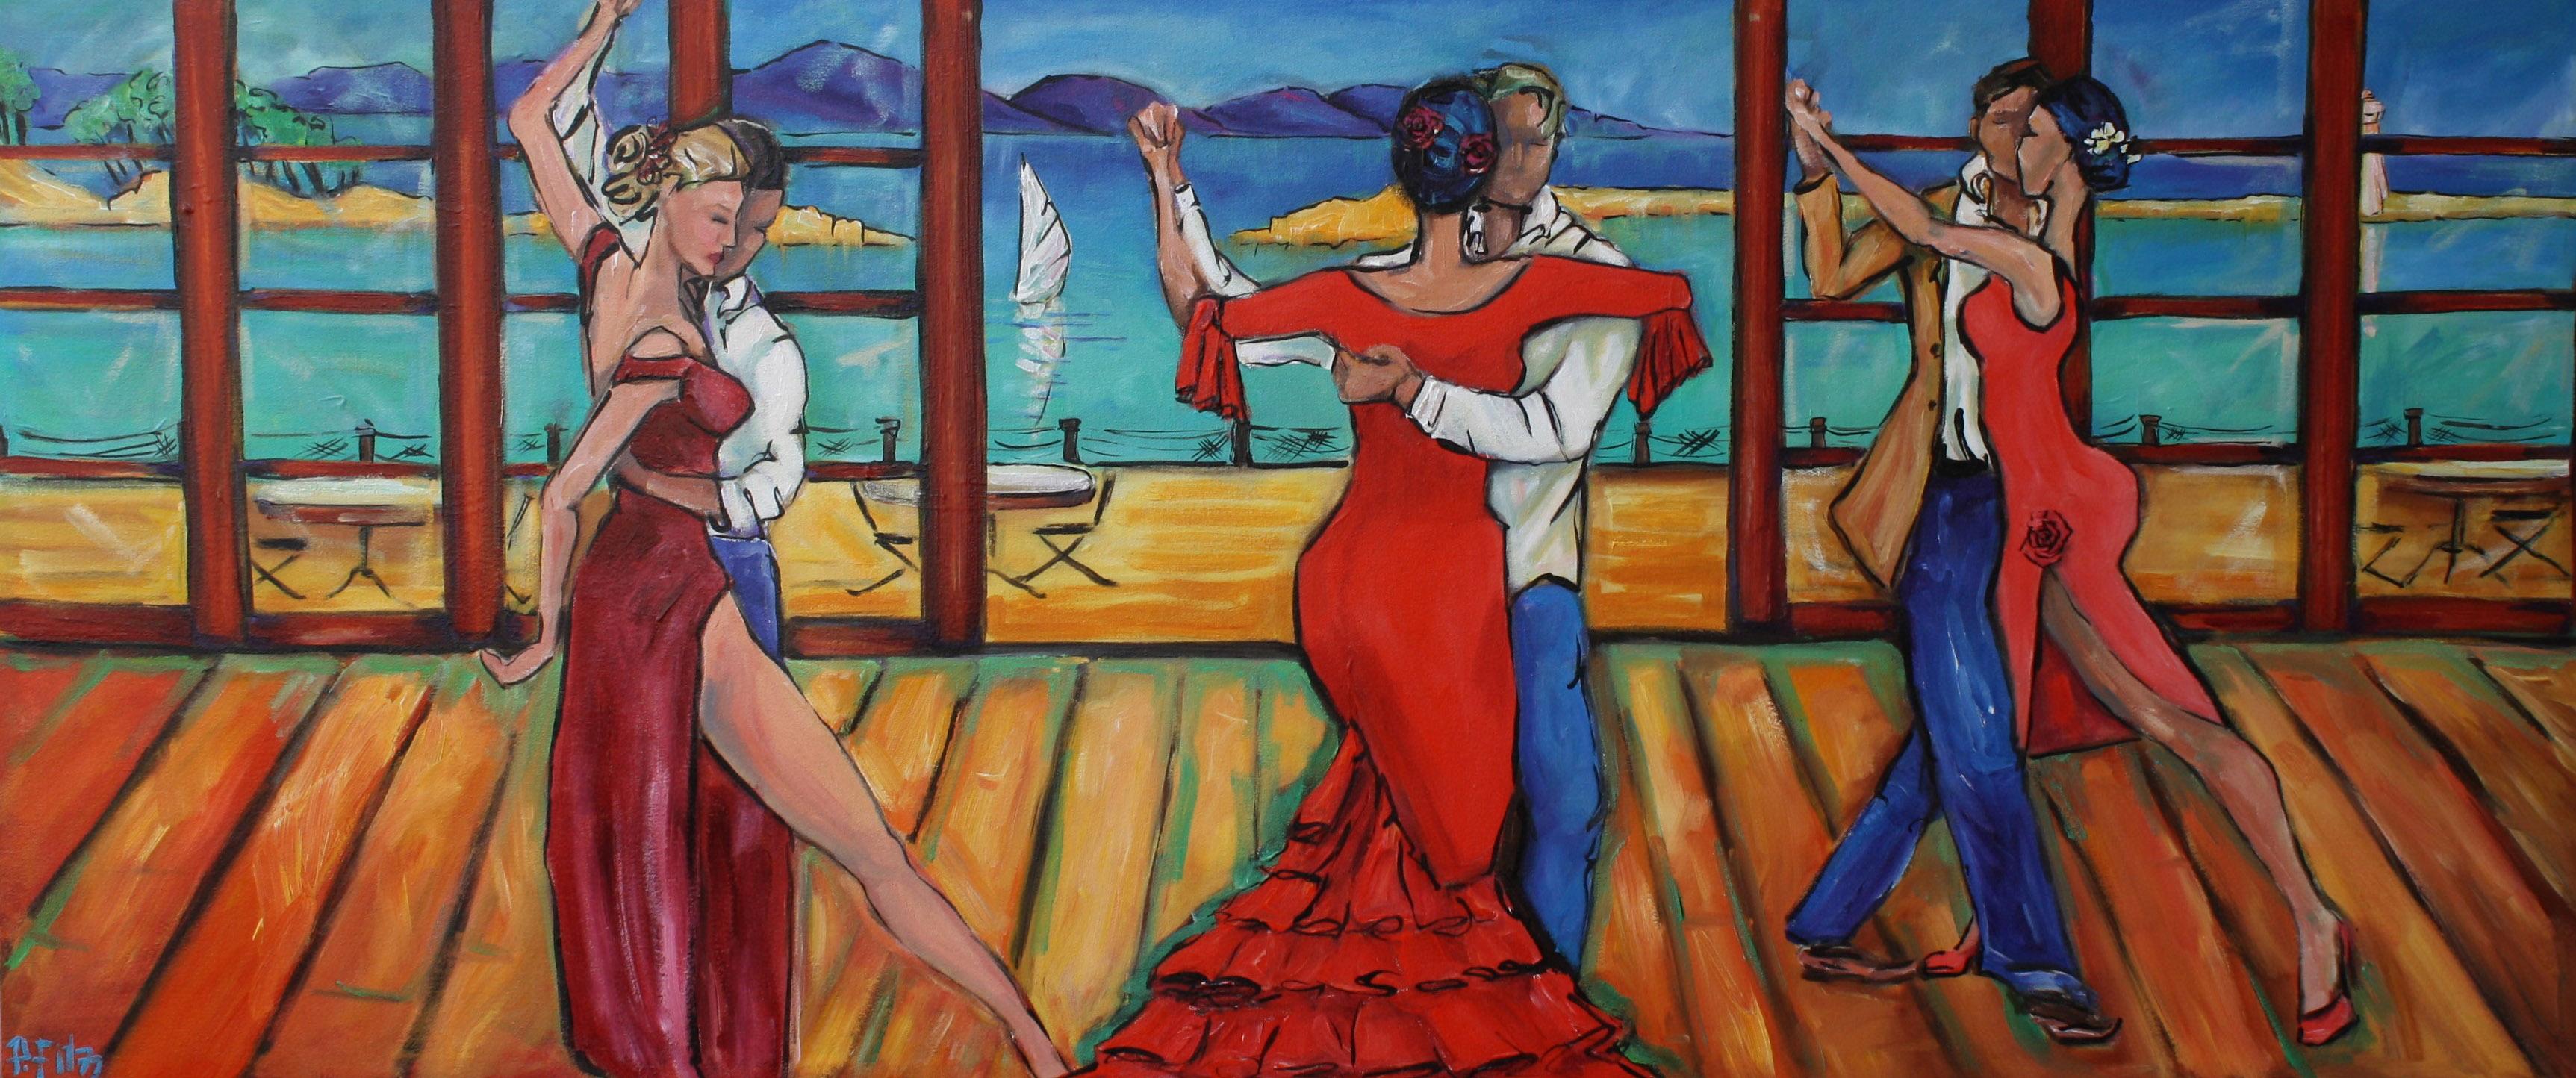 Boathouse salsa